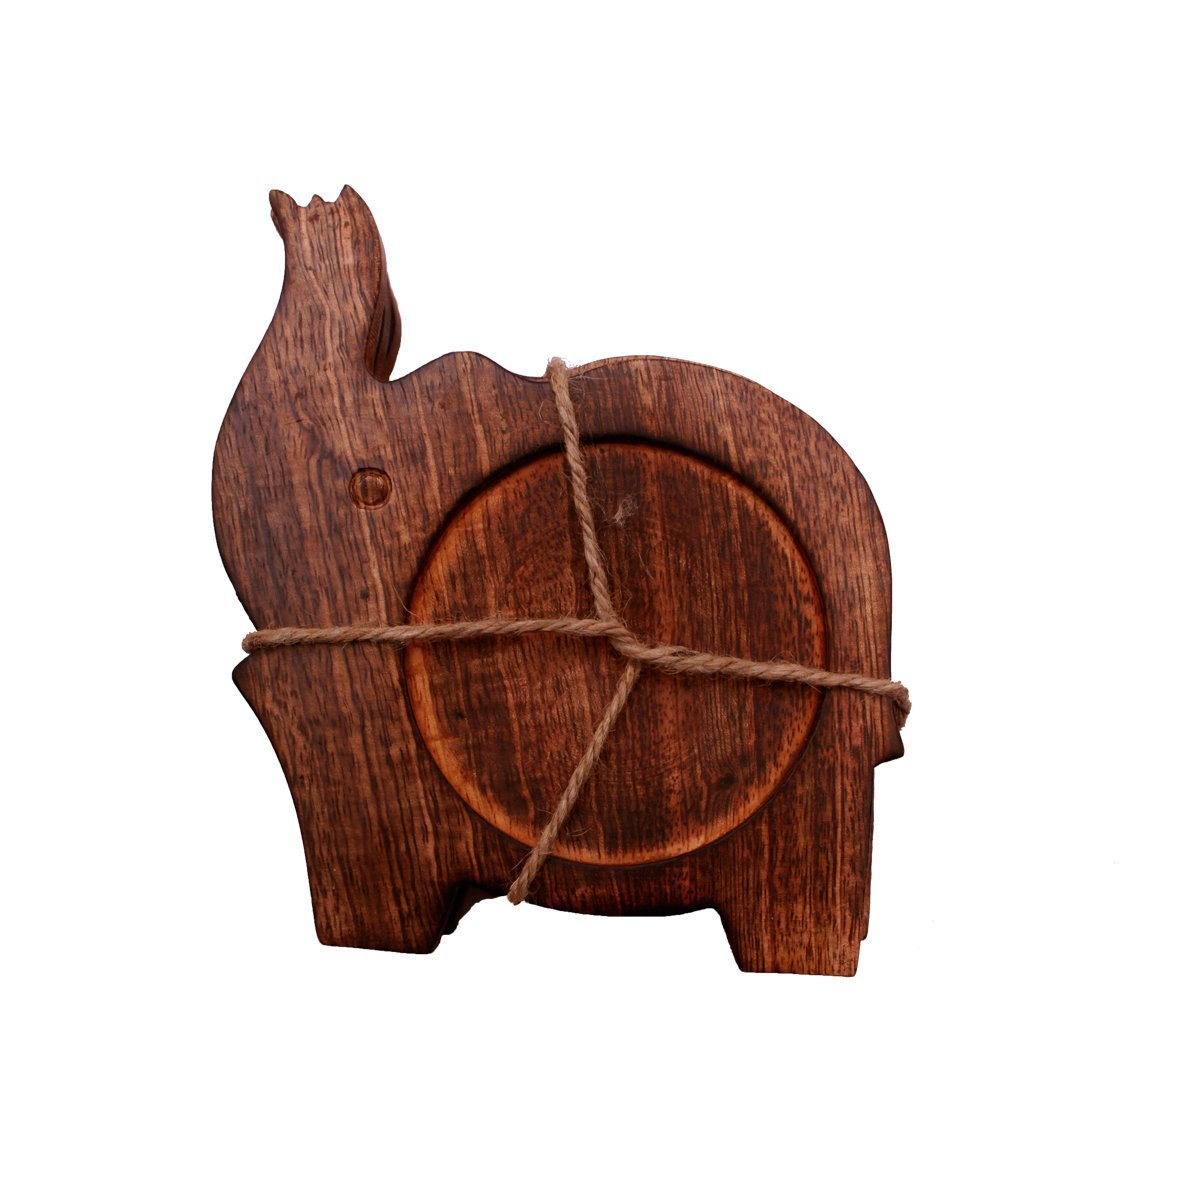 Handmade Wooden Elephant Coaster Holder For Drinks Beer Wine Glass Tea Coffee Cup Mug